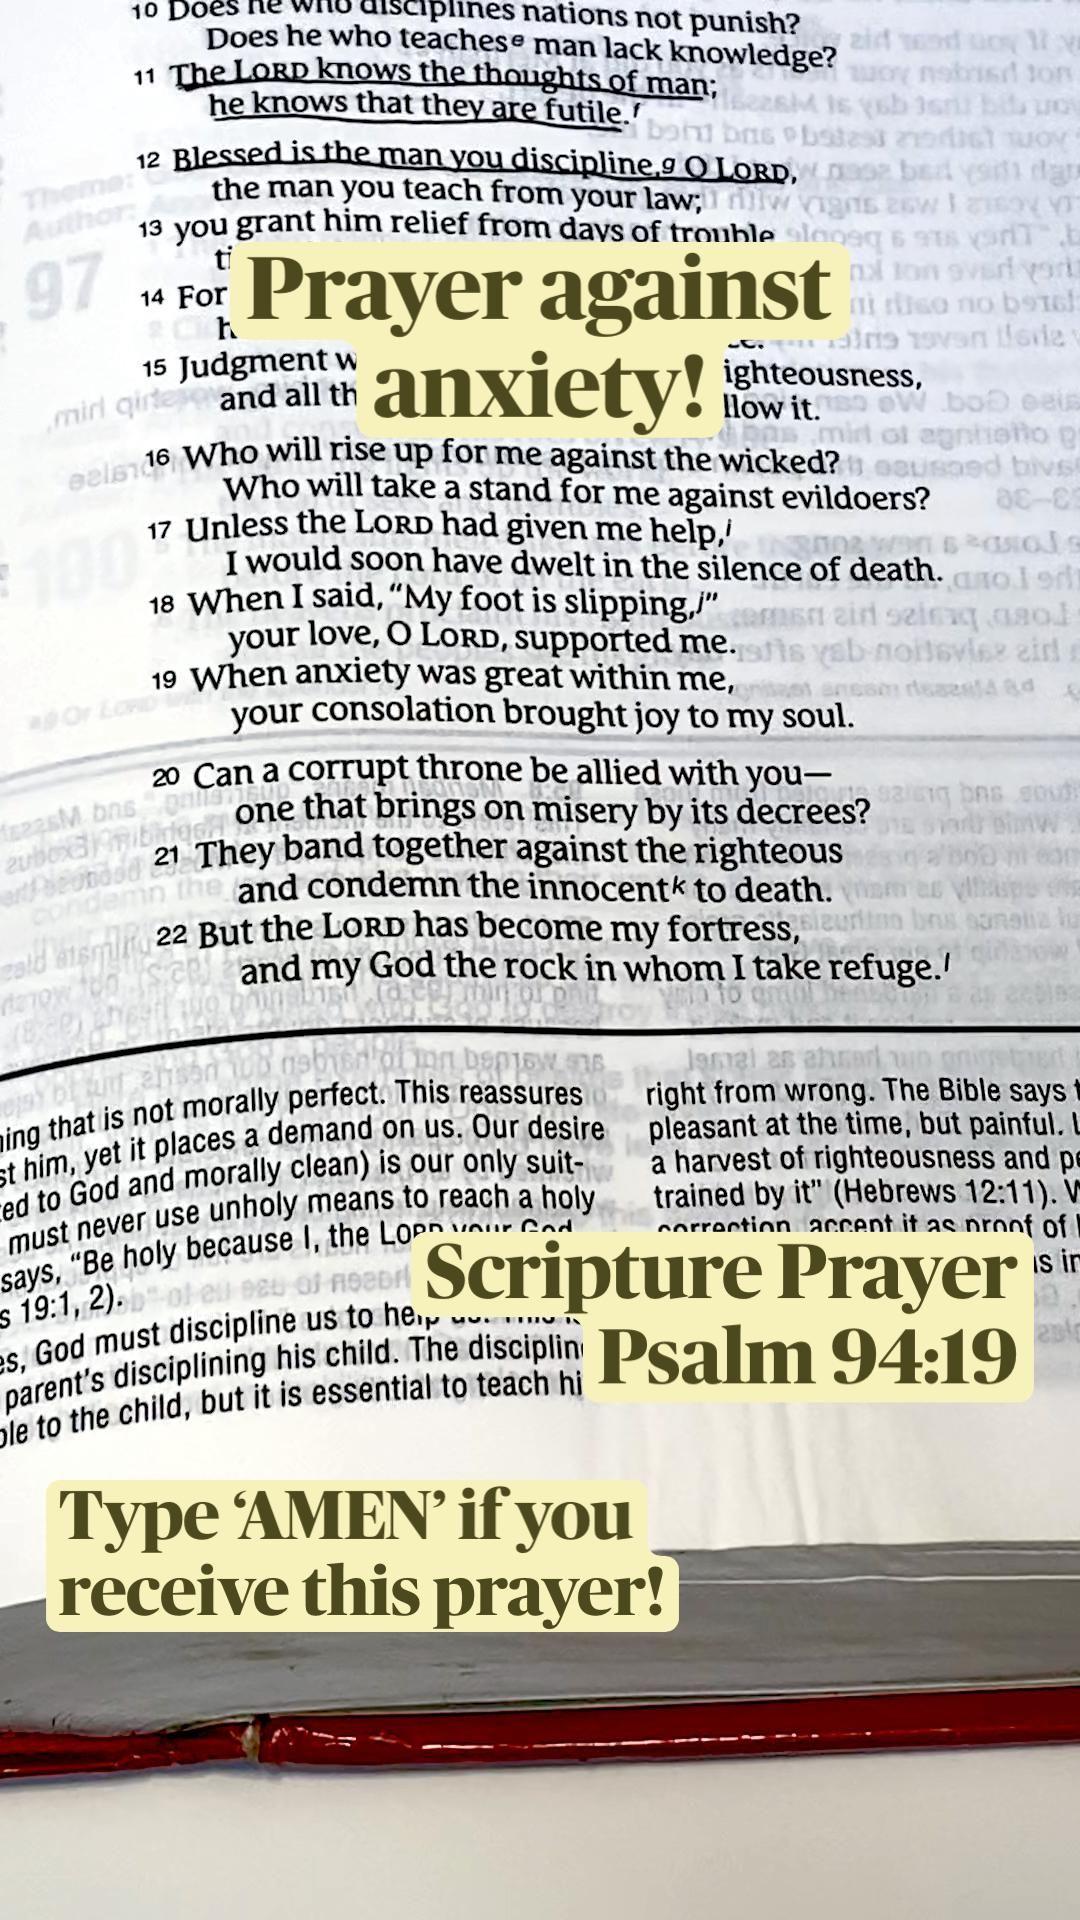 Prayer against anxiety Scripture Prayer: Psalm 94:19